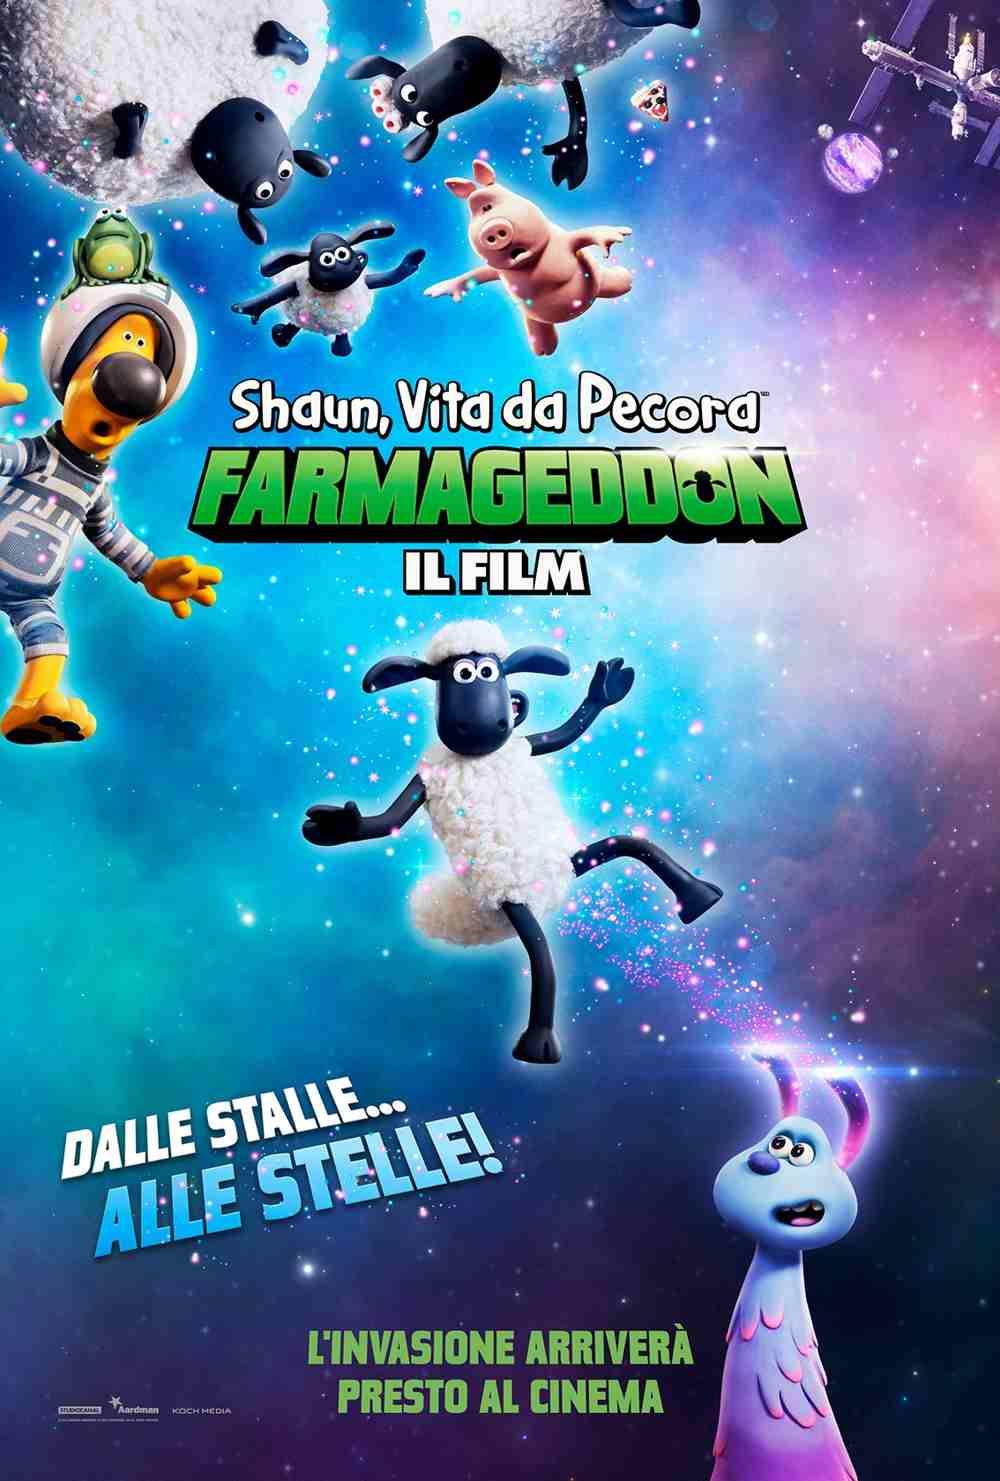 Shaun, Vita da Pecora: Farmageddon– Il Film